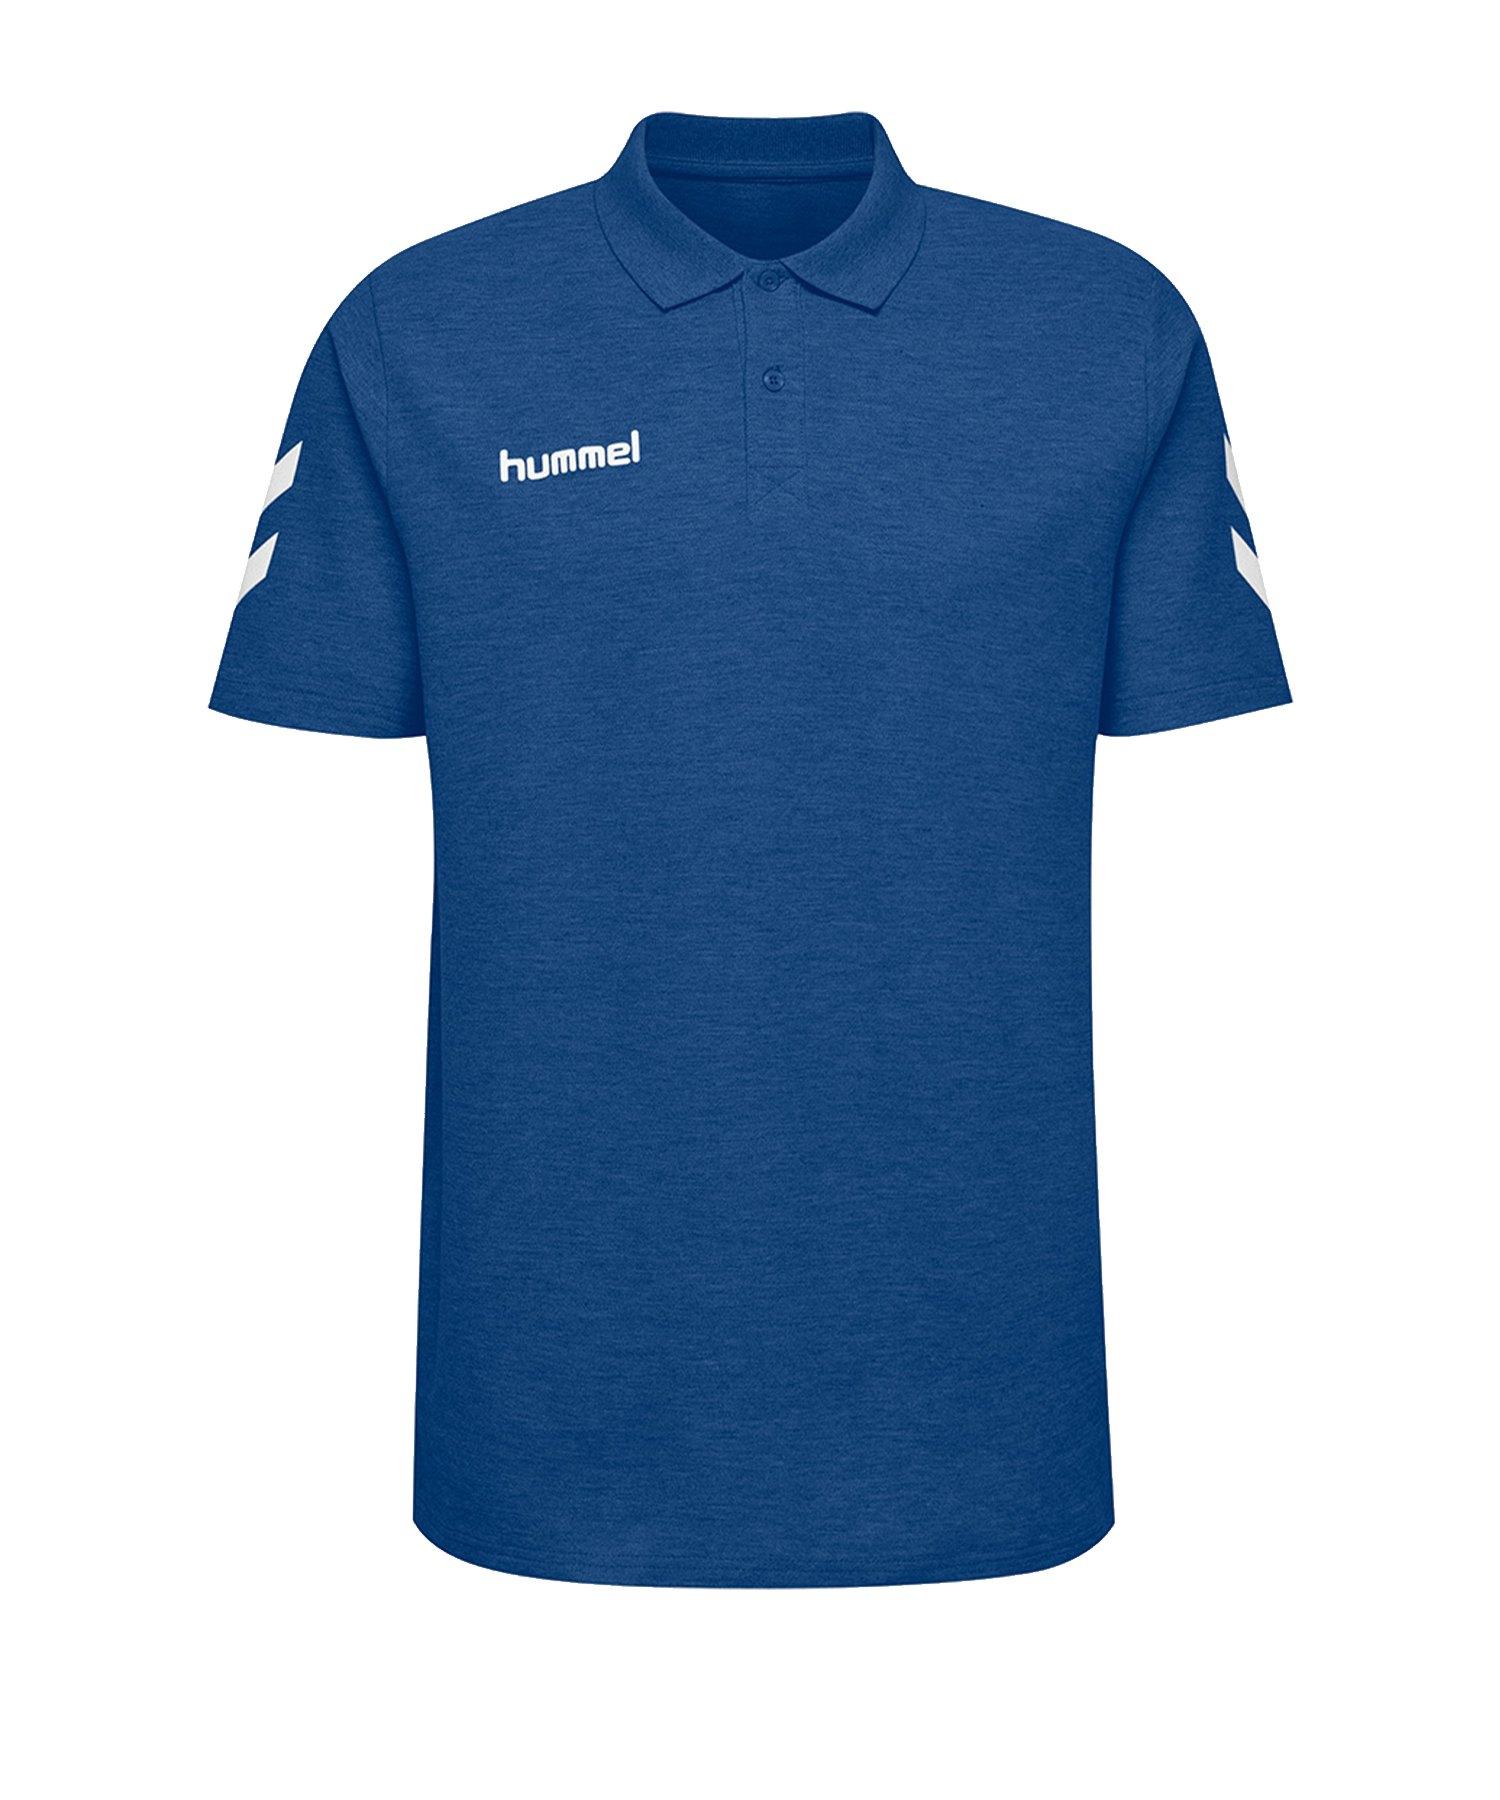 Hummel Cotton Poloshirt Blau F7045 - Blau